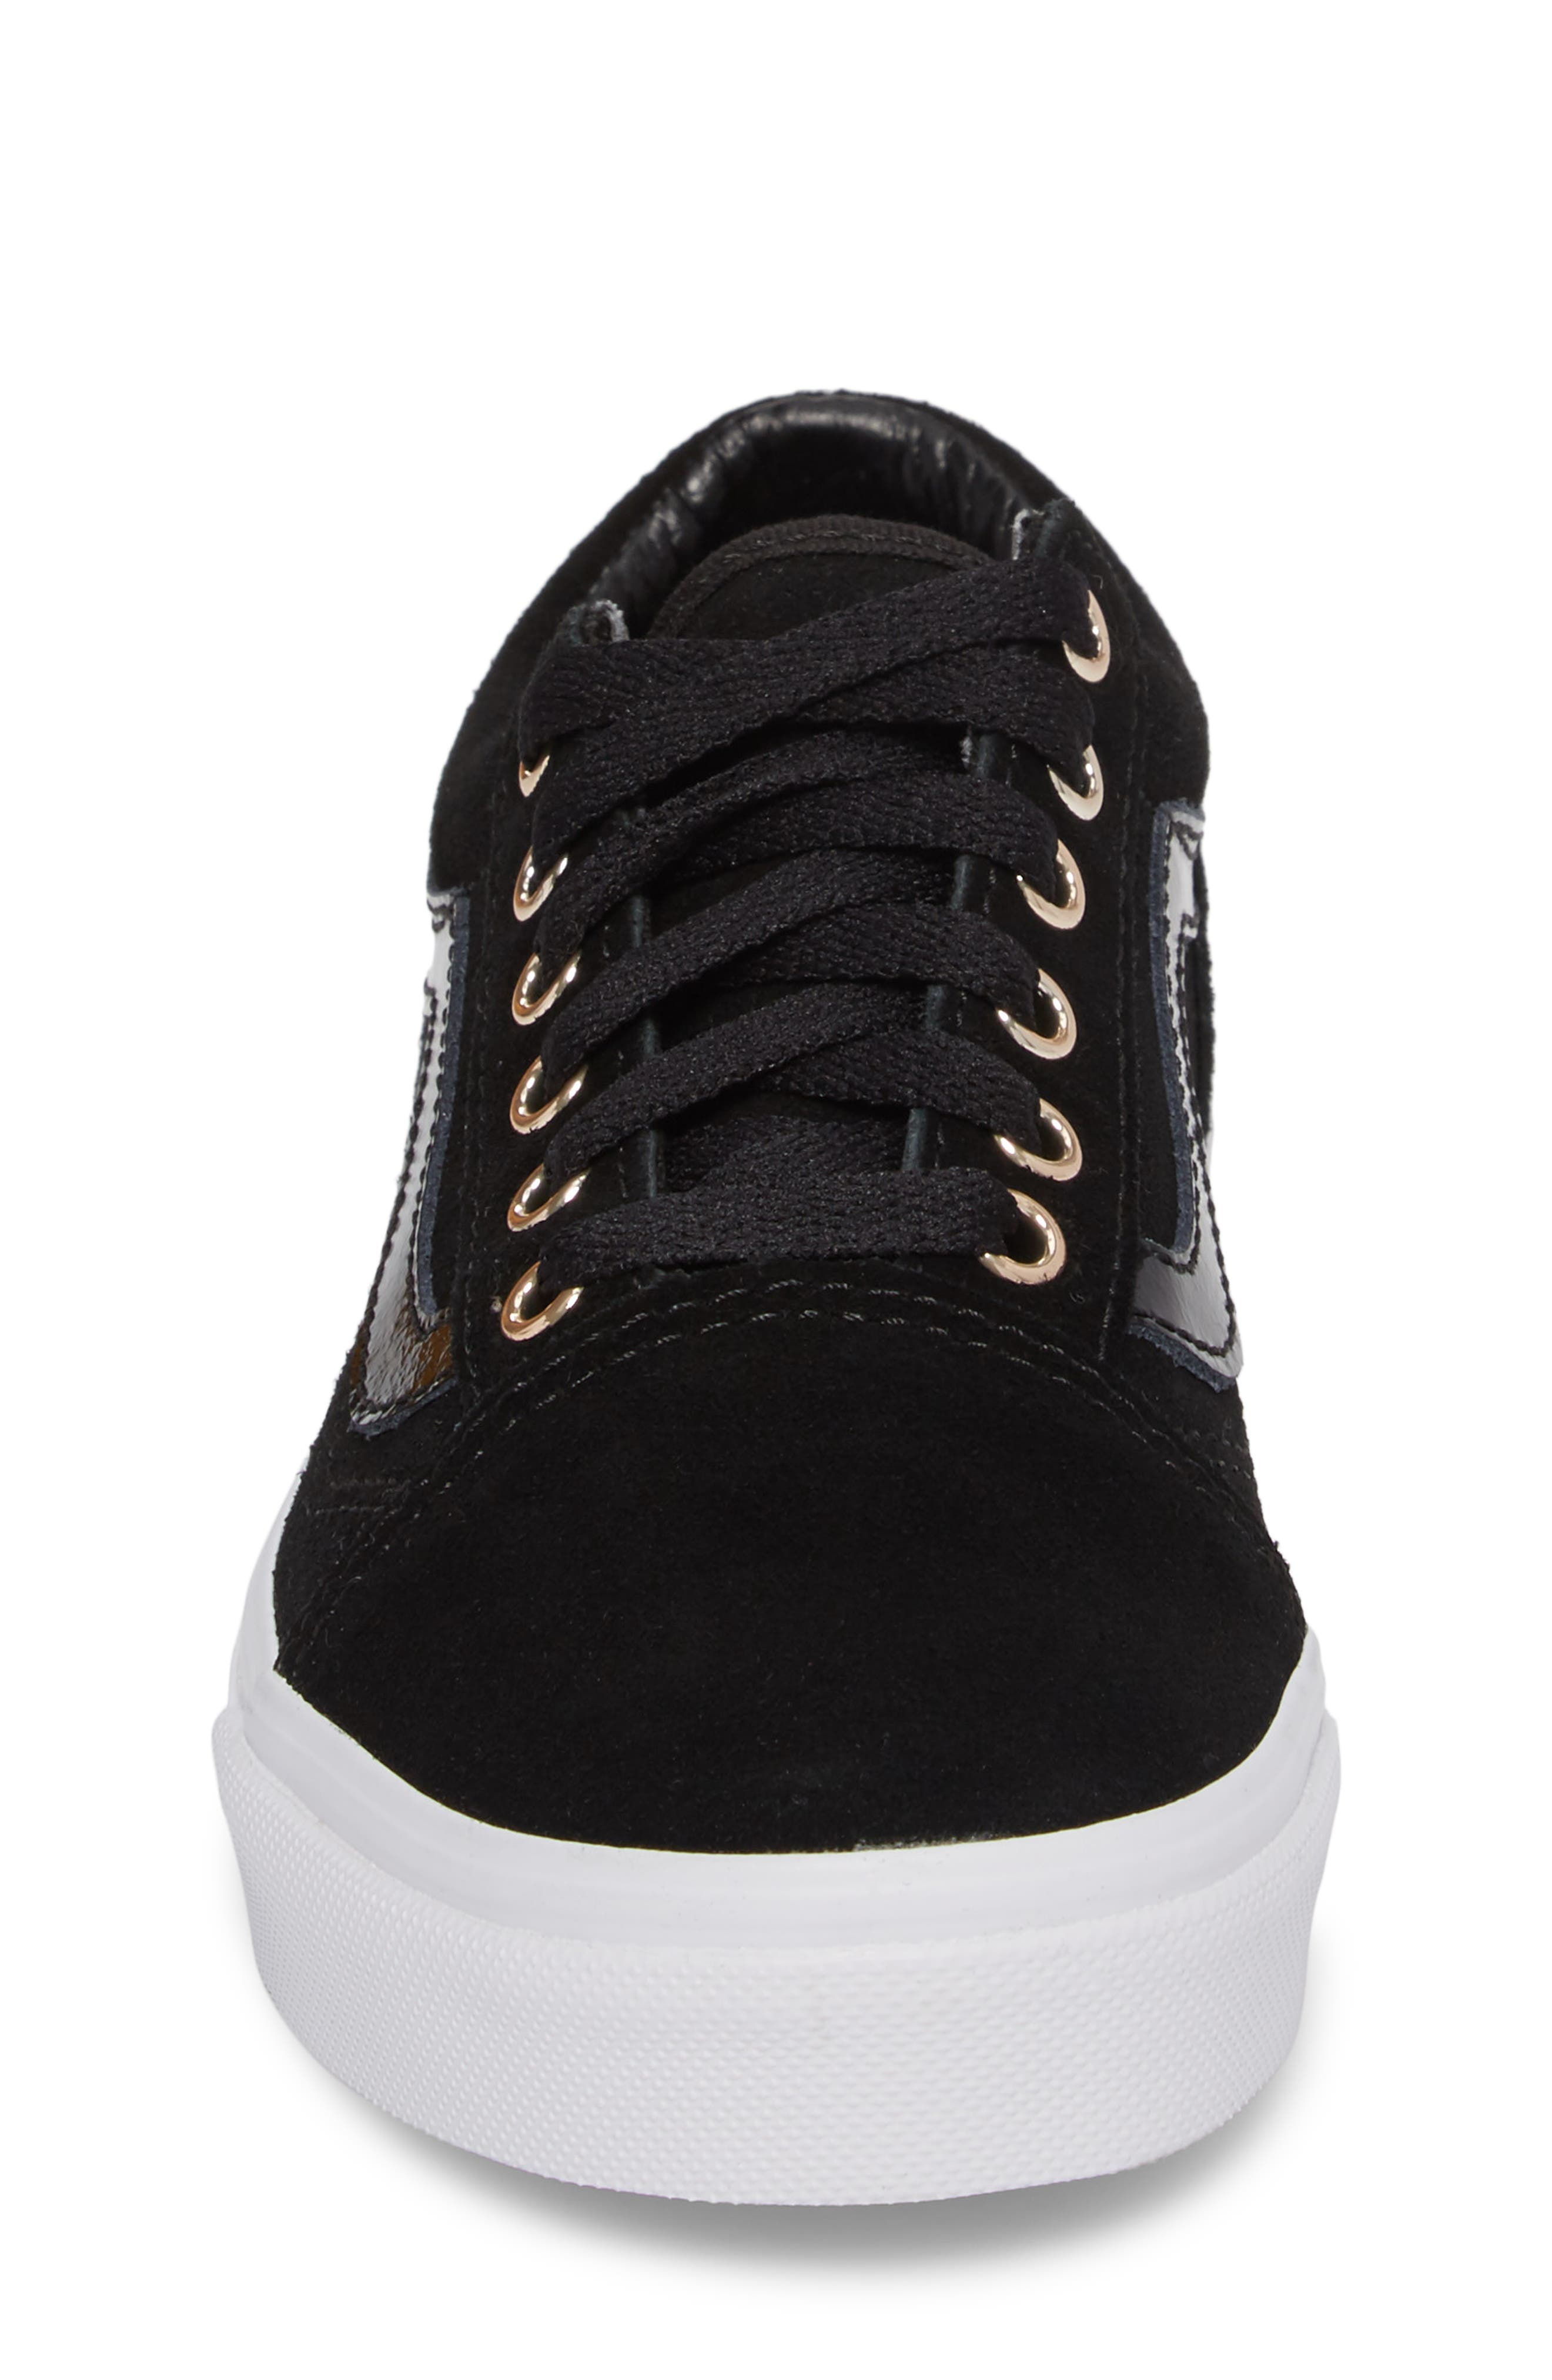 Old Skool Sneaker,                             Alternate thumbnail 4, color,                             Black/ Gold